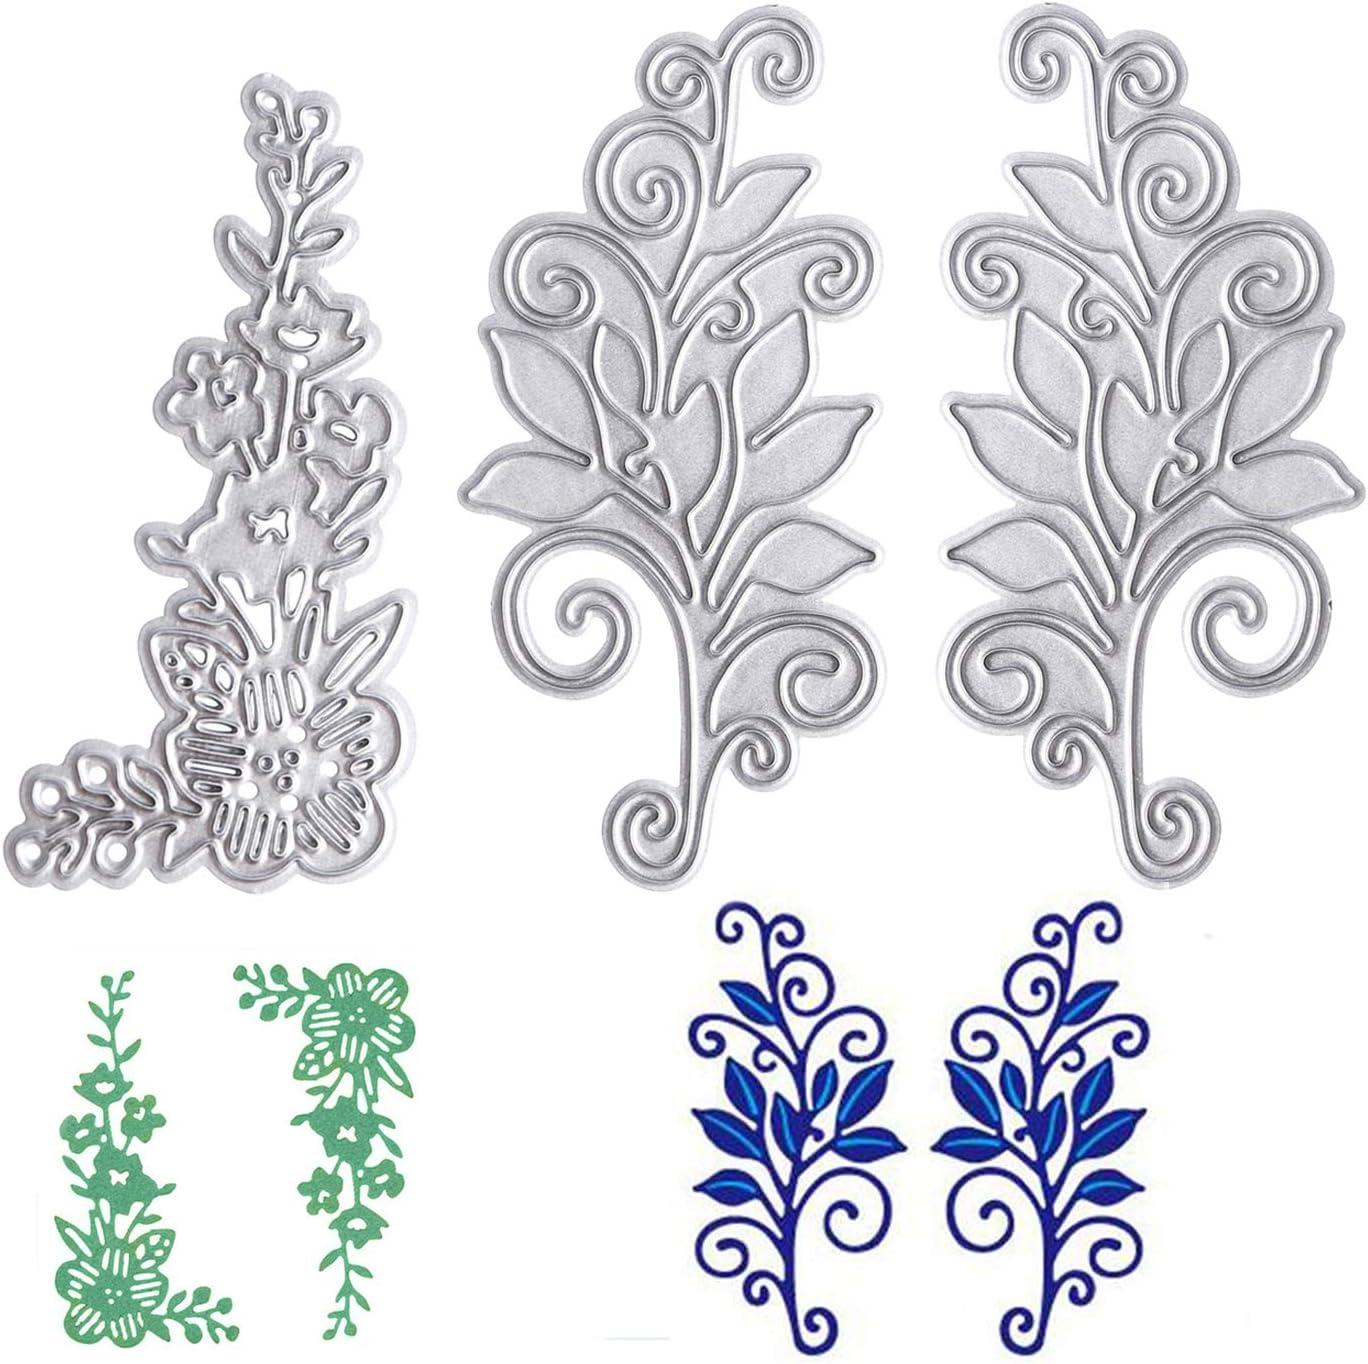 Shrub Flower Metal Cutting Dies Stencil DIY Scrapbooking Paper  Embossing Crafts